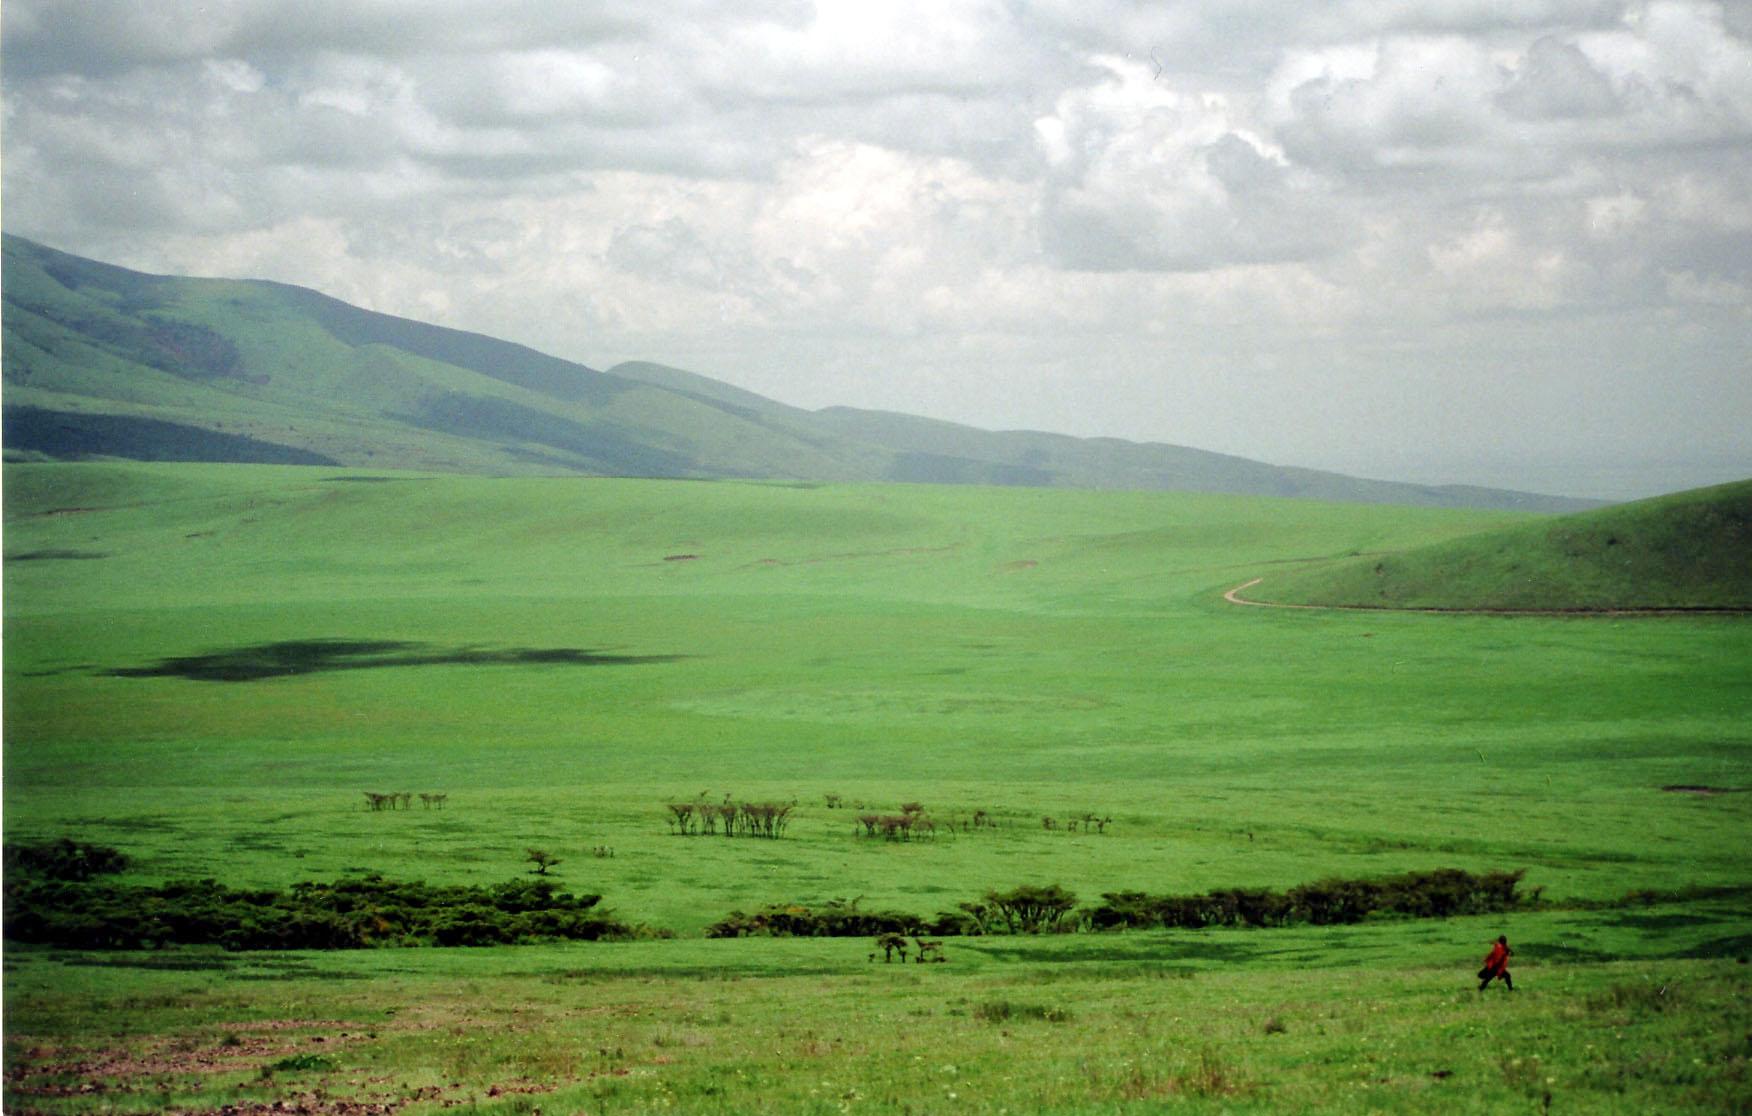 wild grassland encounters « Blog of Holding